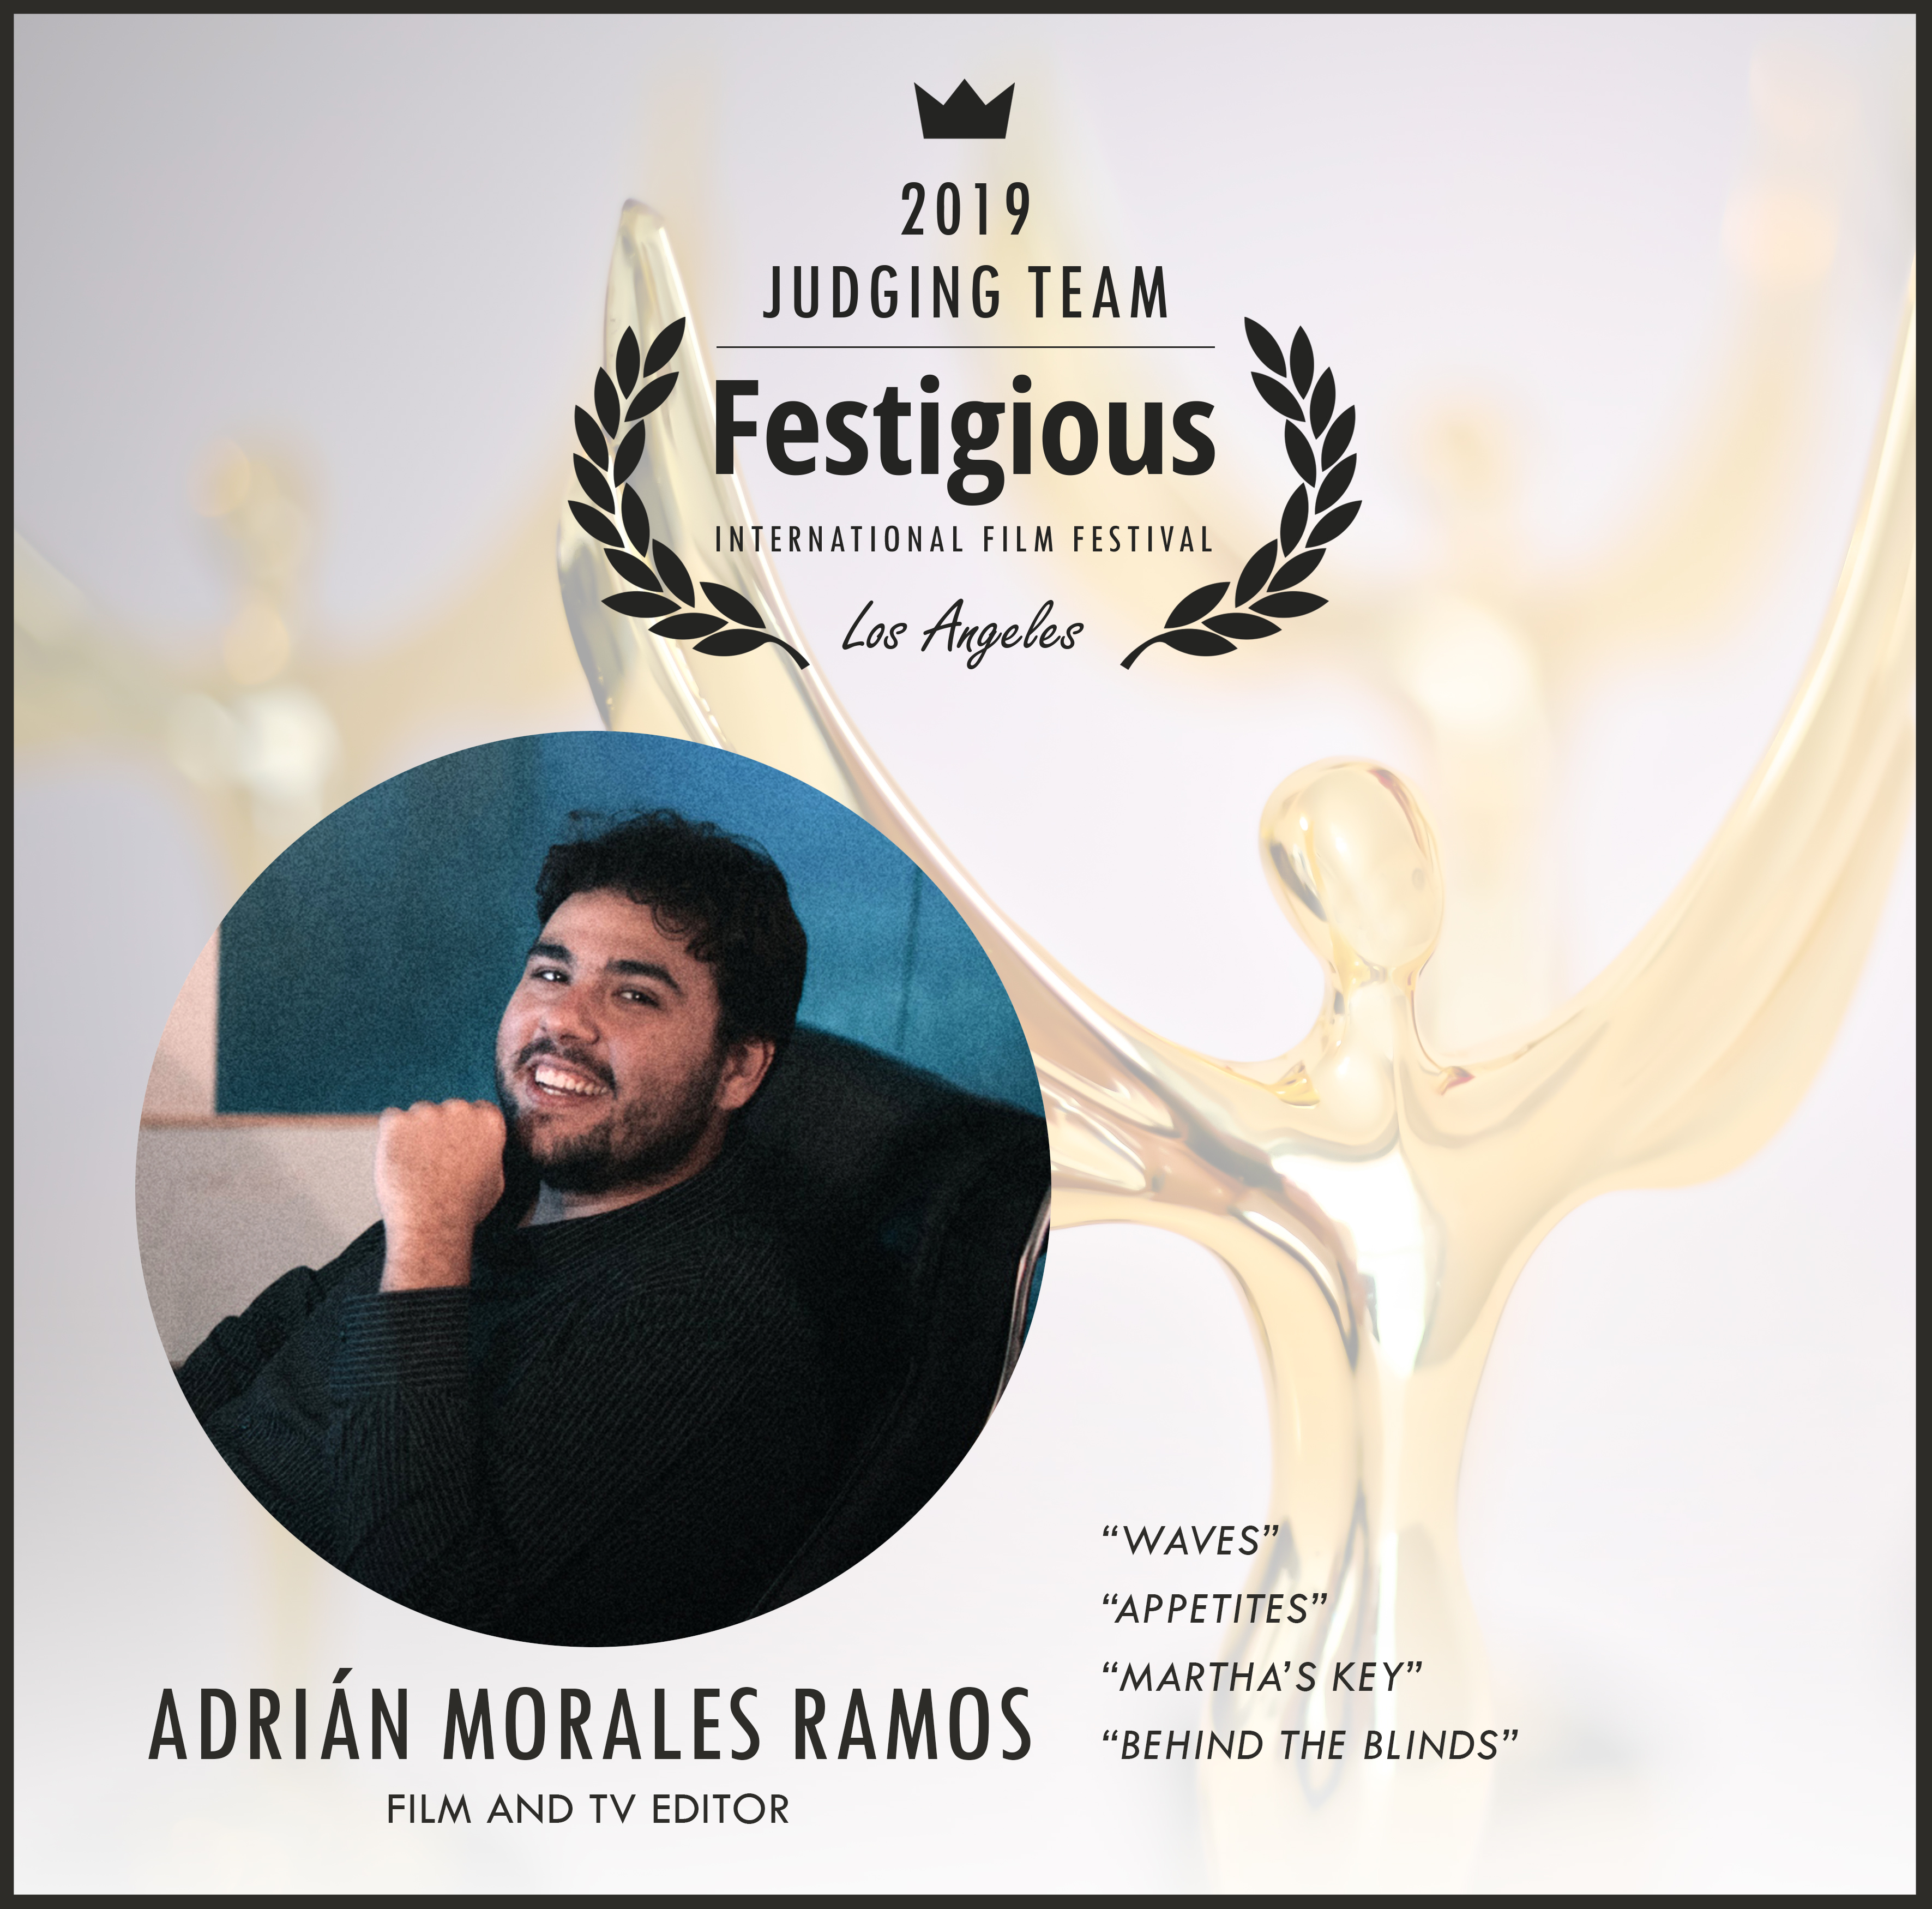 Adrián_Morales_Ramos_Festigious